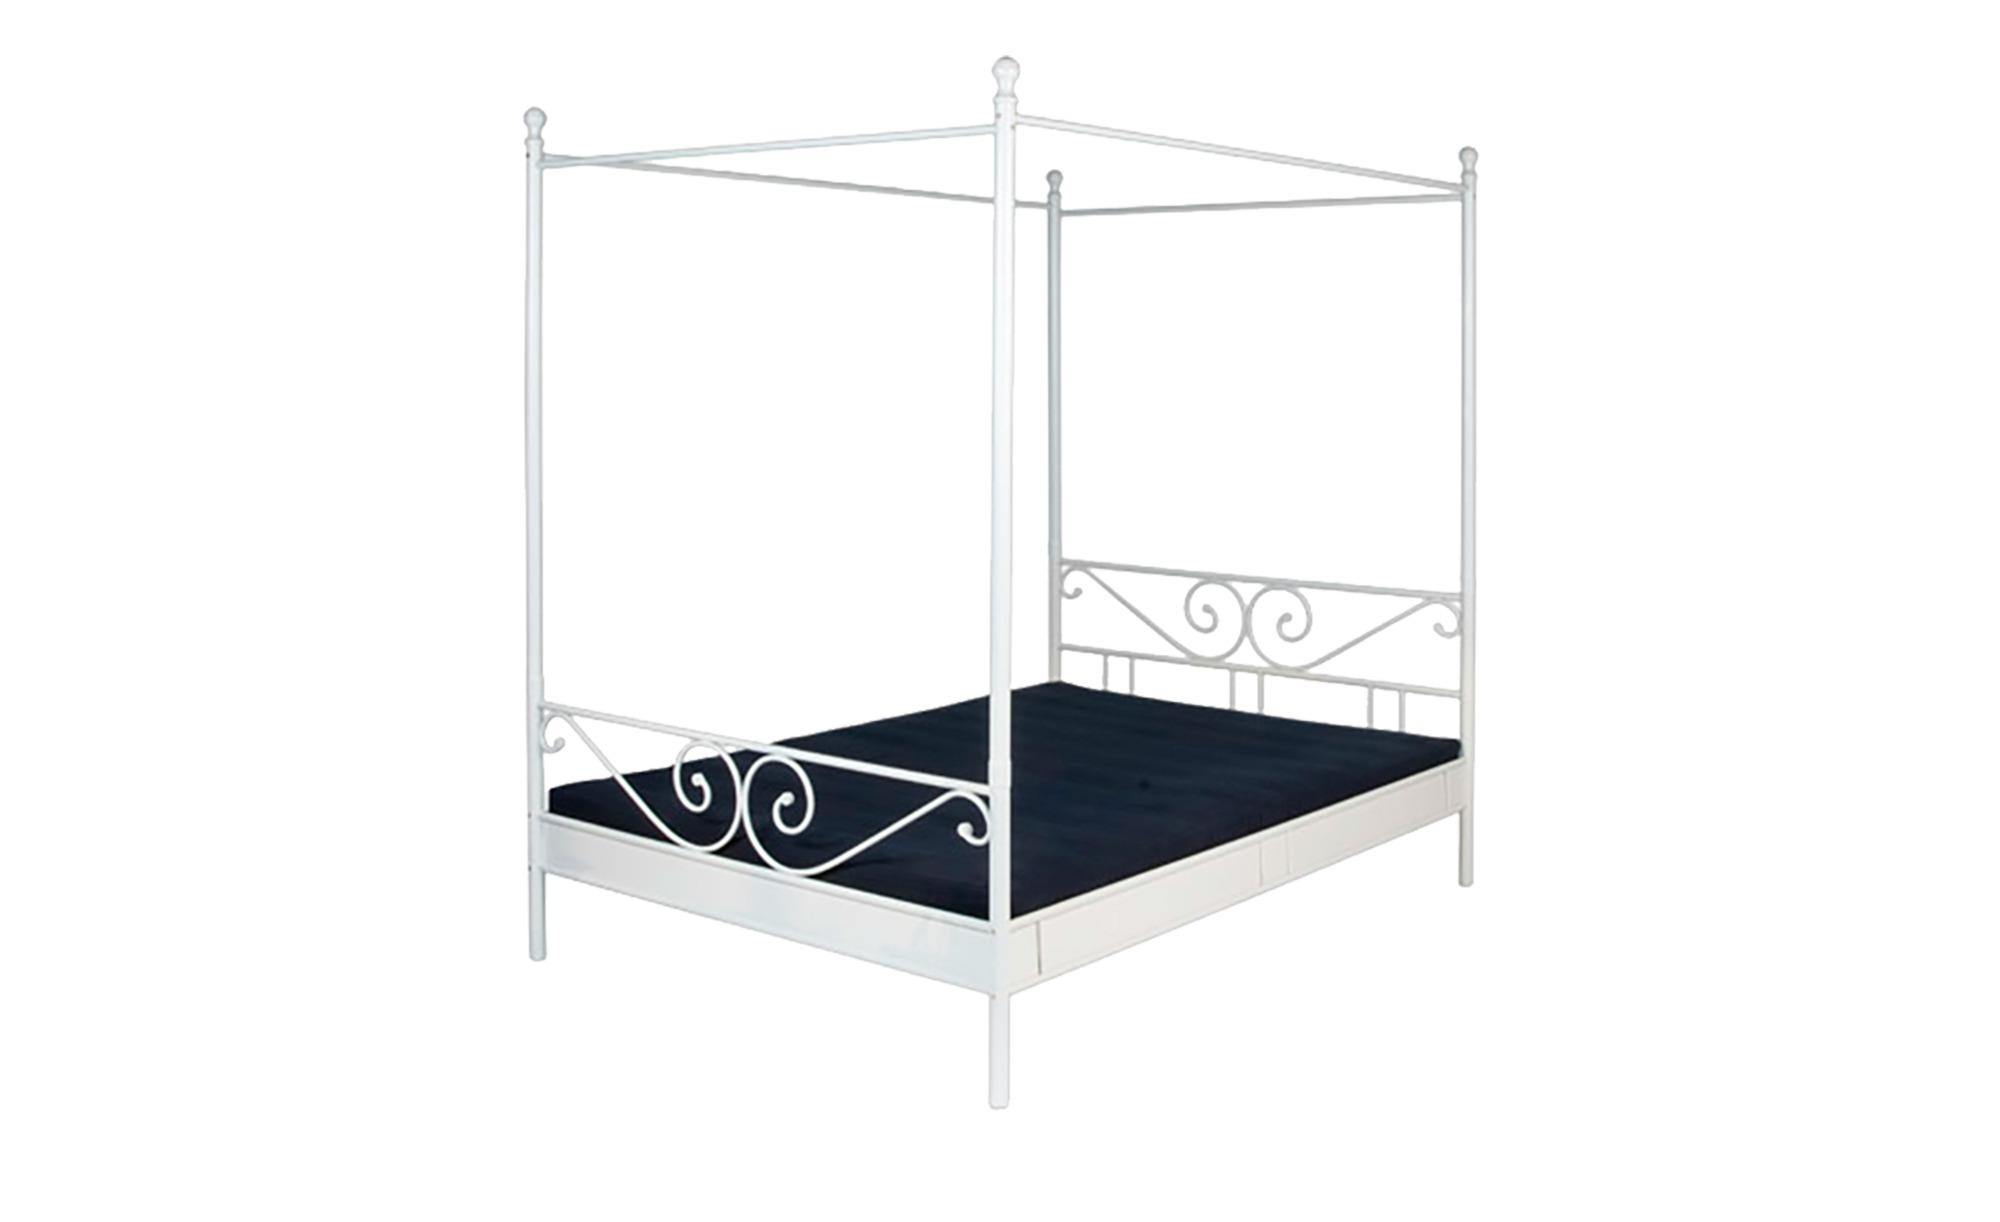 metallbett himmelbett ca 180x200 cm 180 cm wei. Black Bedroom Furniture Sets. Home Design Ideas